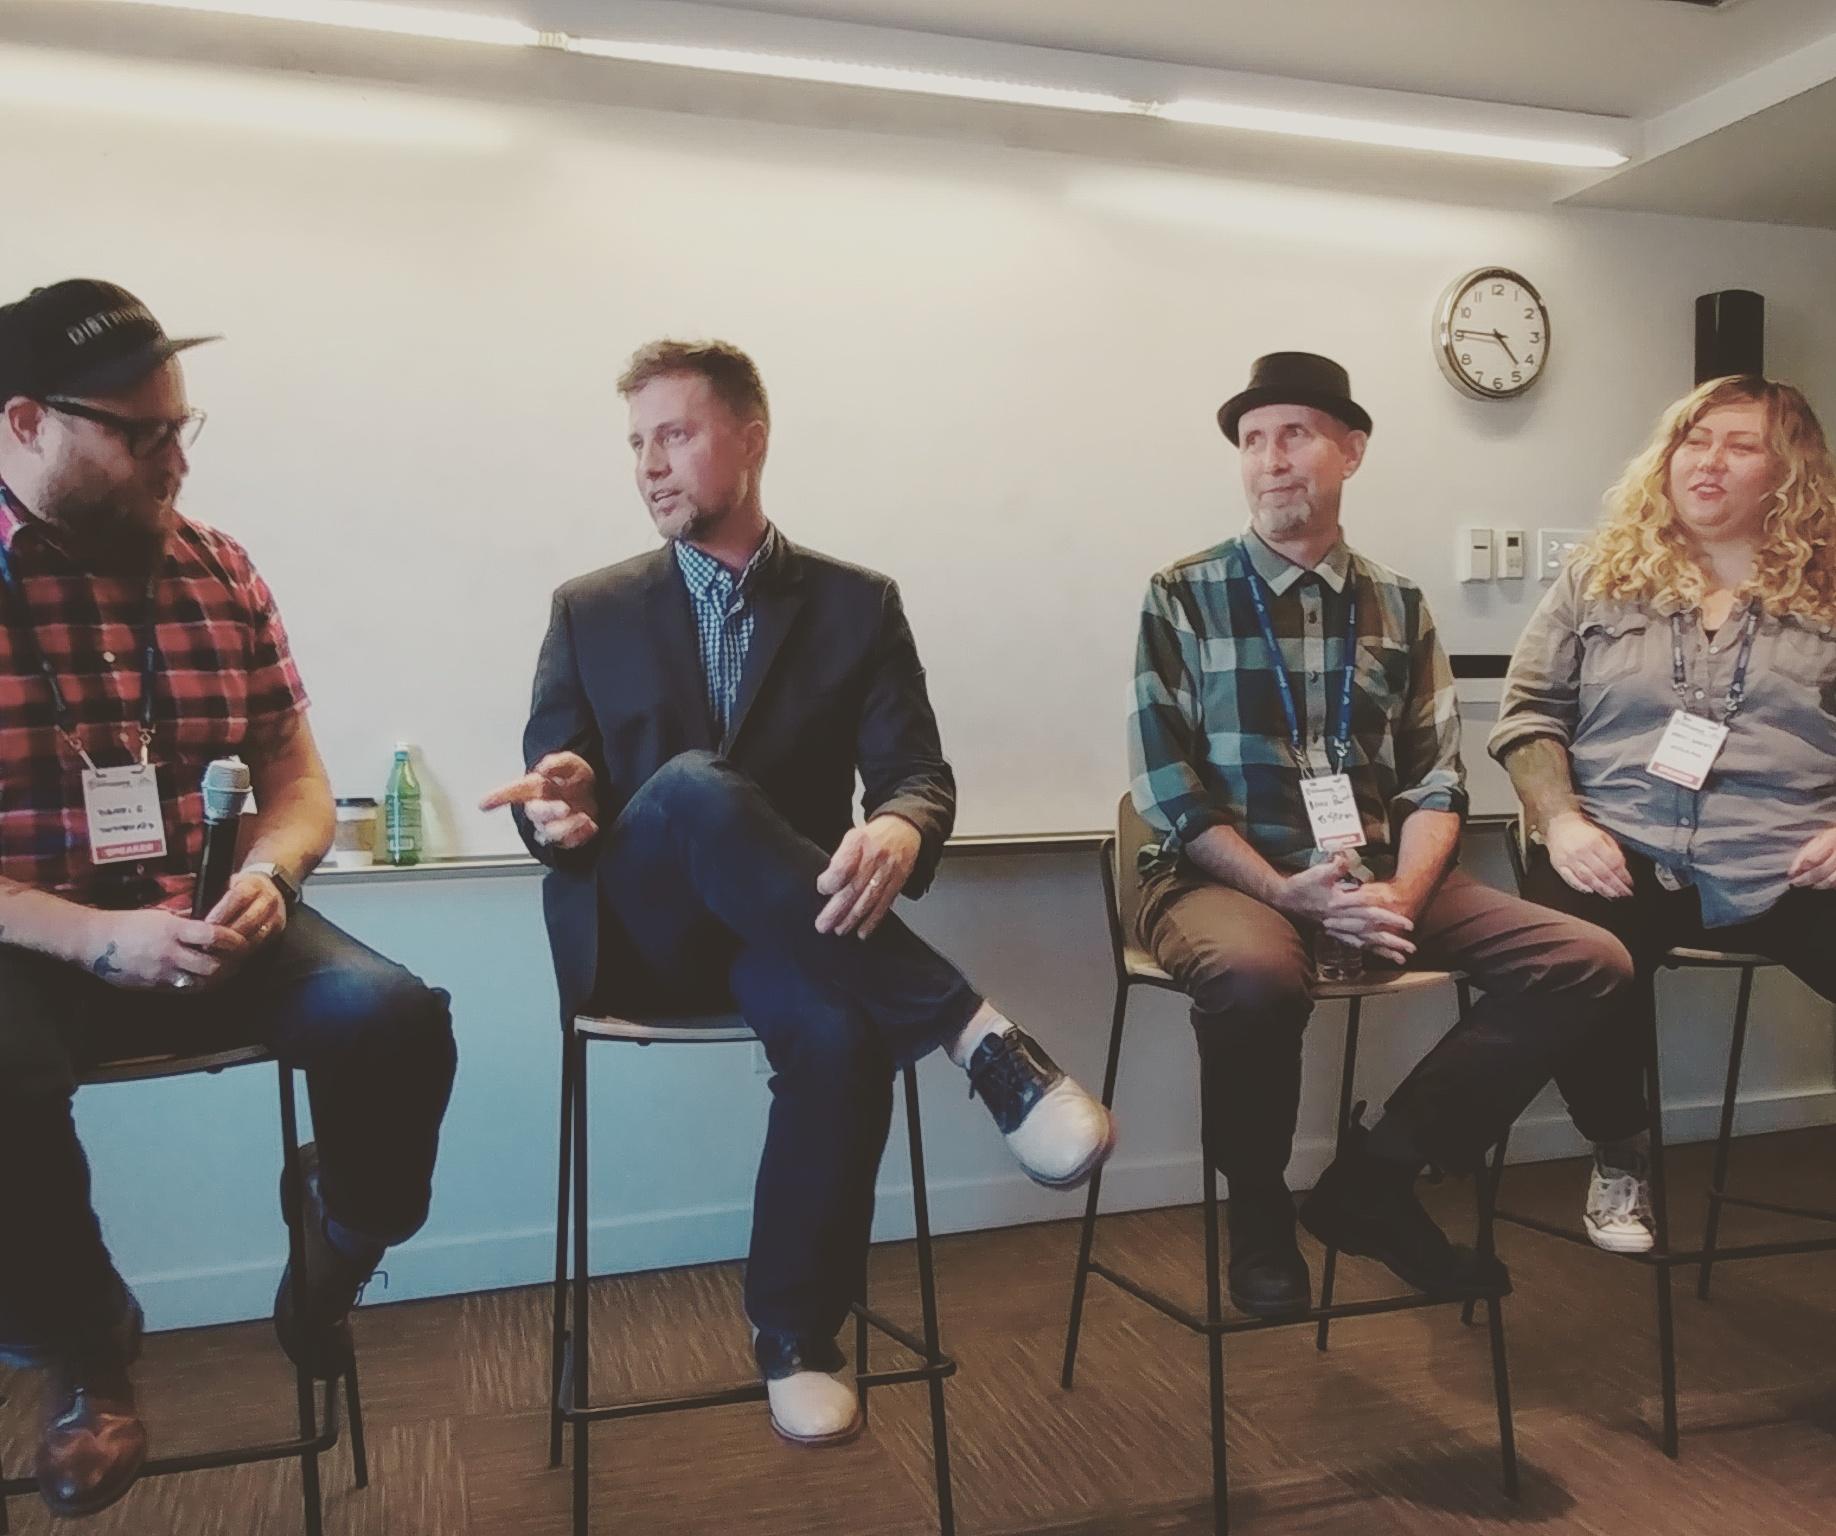 Music tech panel at Seattle Startup week 2017: LEFT TO RIGHT:  Daniel G. Harmann - (Director, Artist Relations, DistroKid), Adam Farish  - (CEO, 8Stem Interactive Music), Bruce   Pavitt  - (Creative Director, 8Stem Interactive Music (Founder of Subpop Records)), Meli   Darby  - (Vulcan/Upstream Music Fest + Summit)